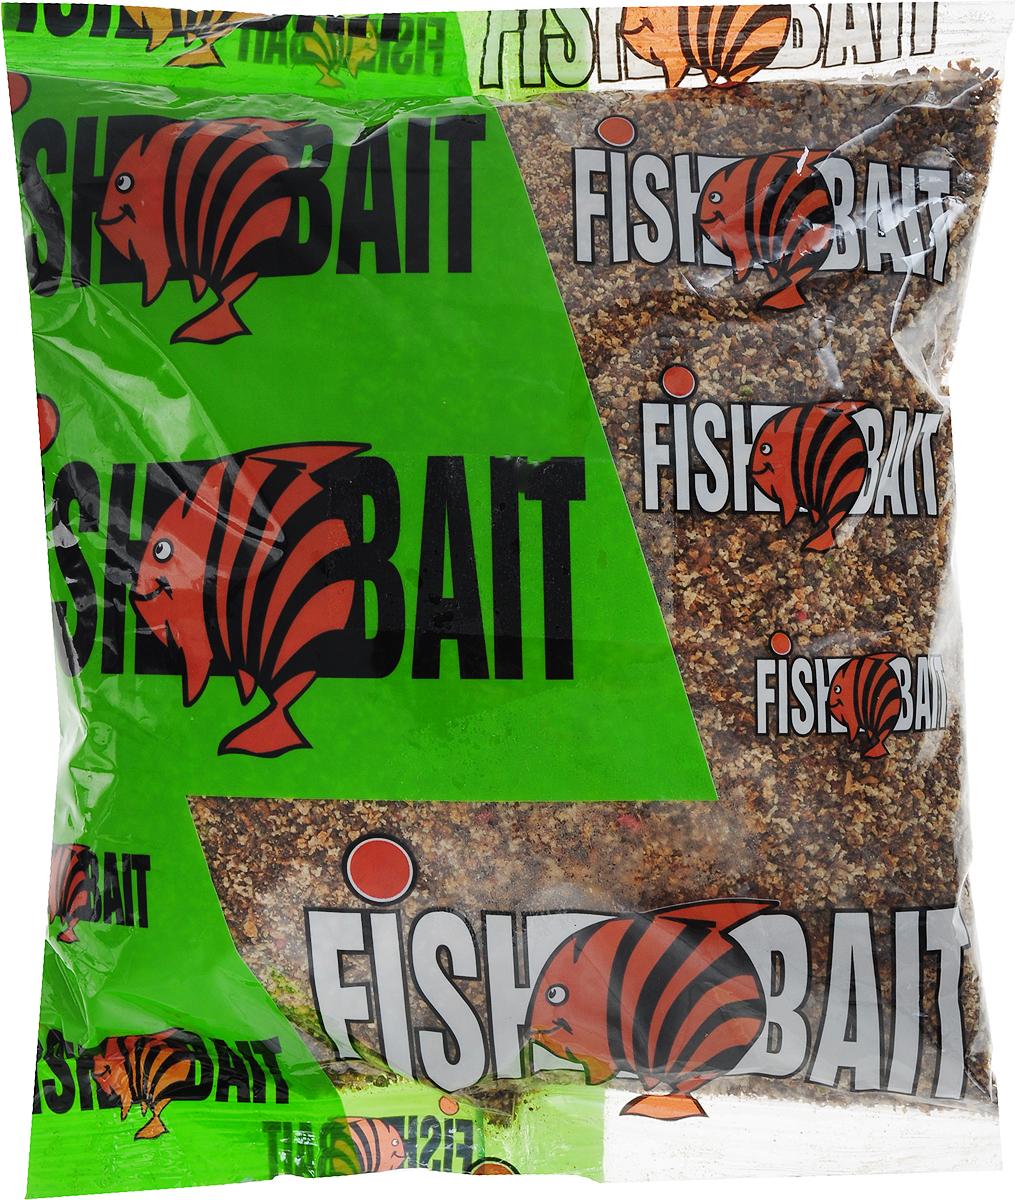 Сухари для прикормки FishBait Бисквитные, 0,5 кг